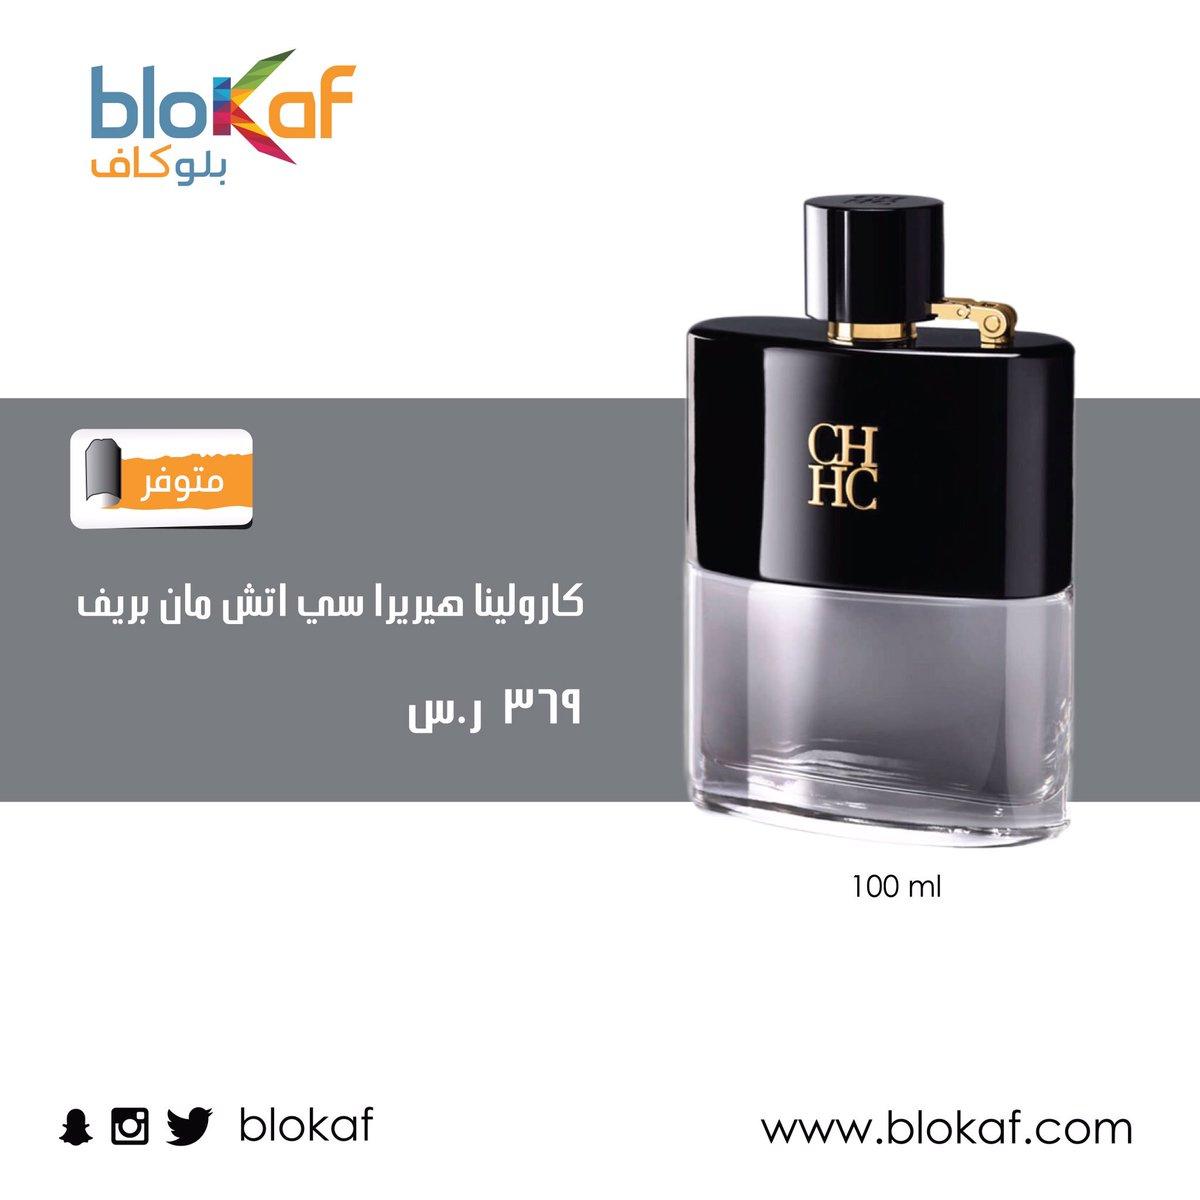 b55643612 علي عبدو صمدو (@hhh_2222) | Twitter